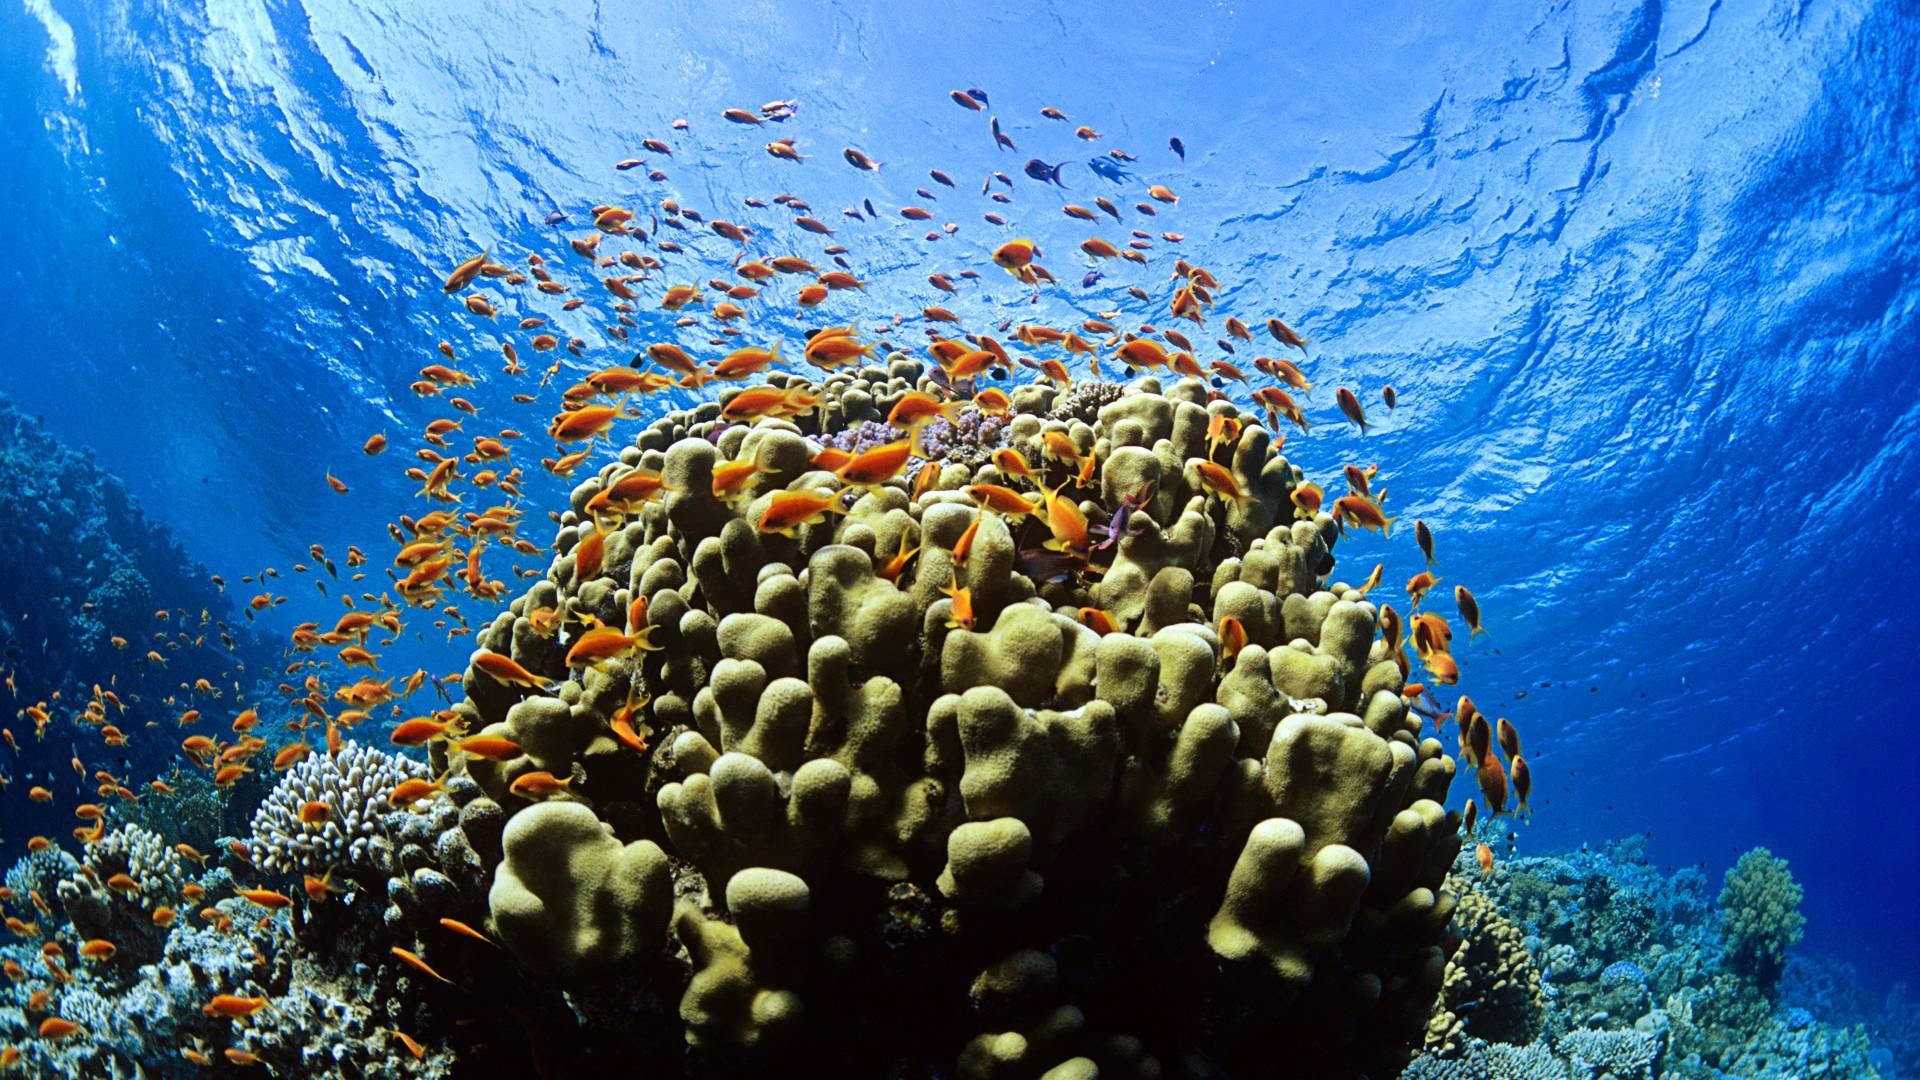 beautiful under water wallpaper